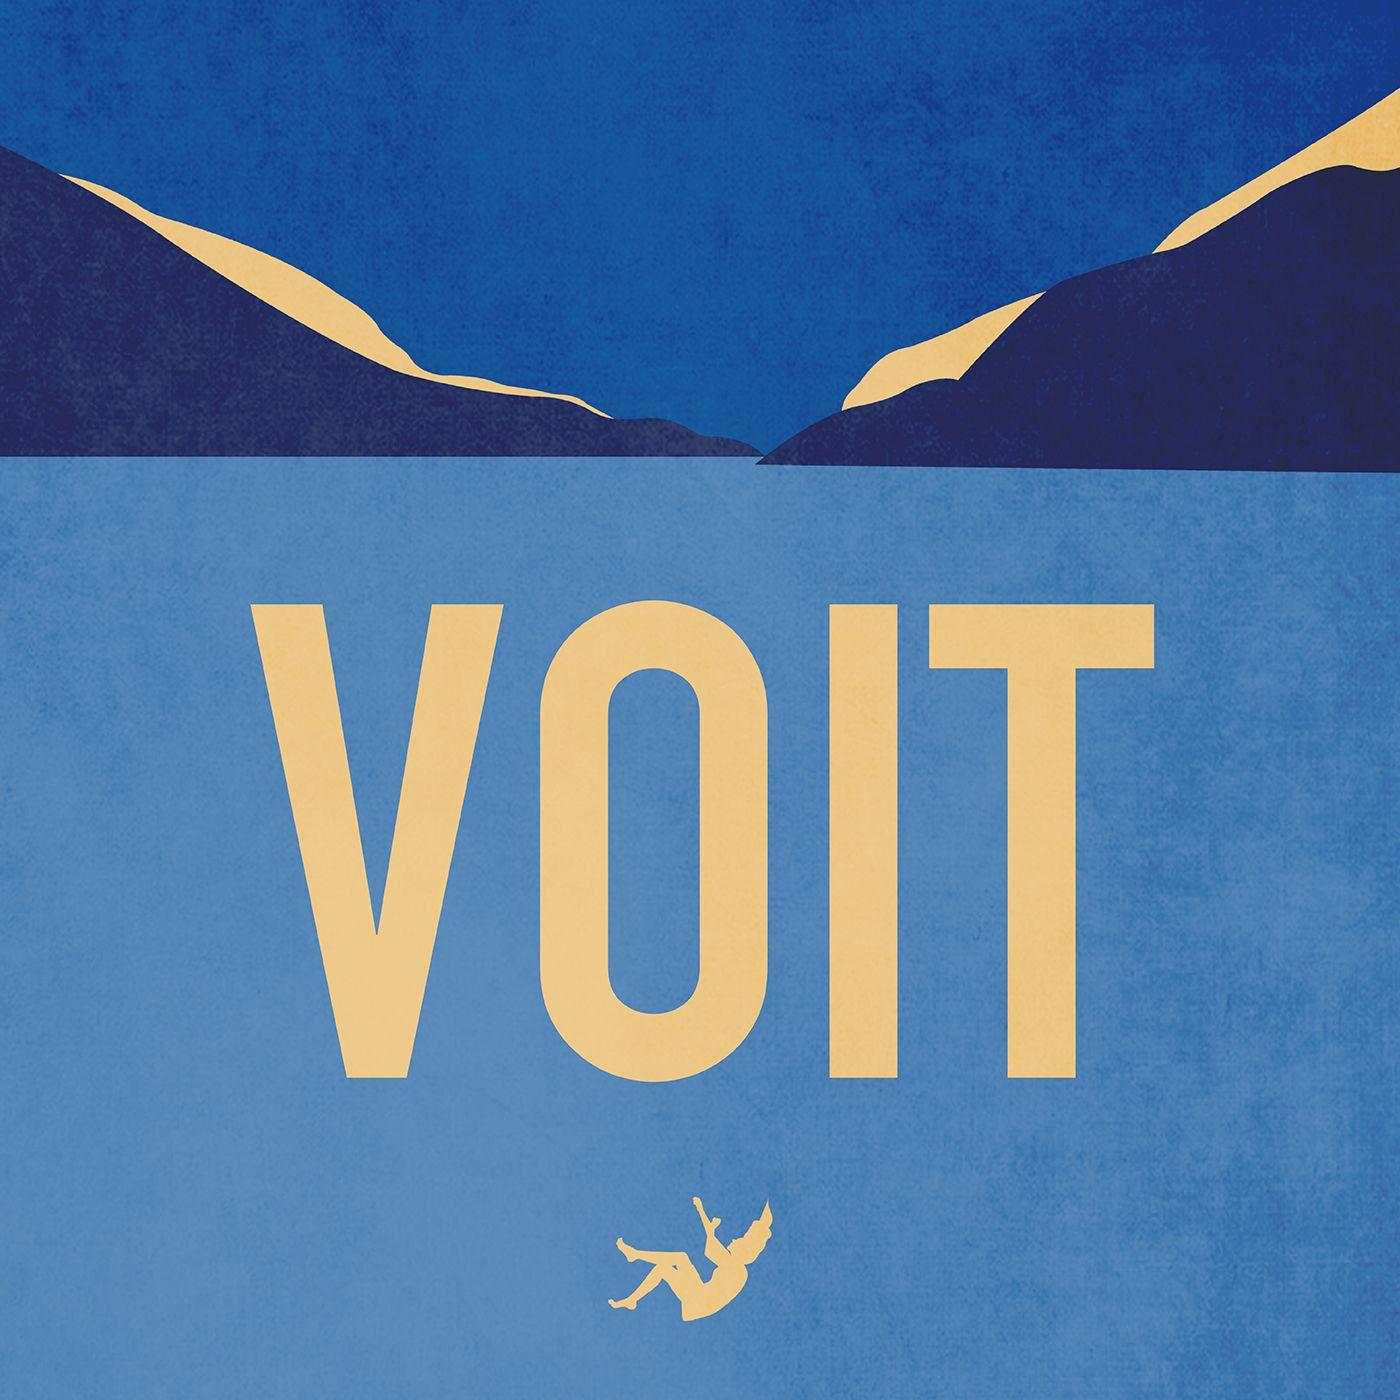 VOIT / VUOTO - Episodio 5 - Scroll